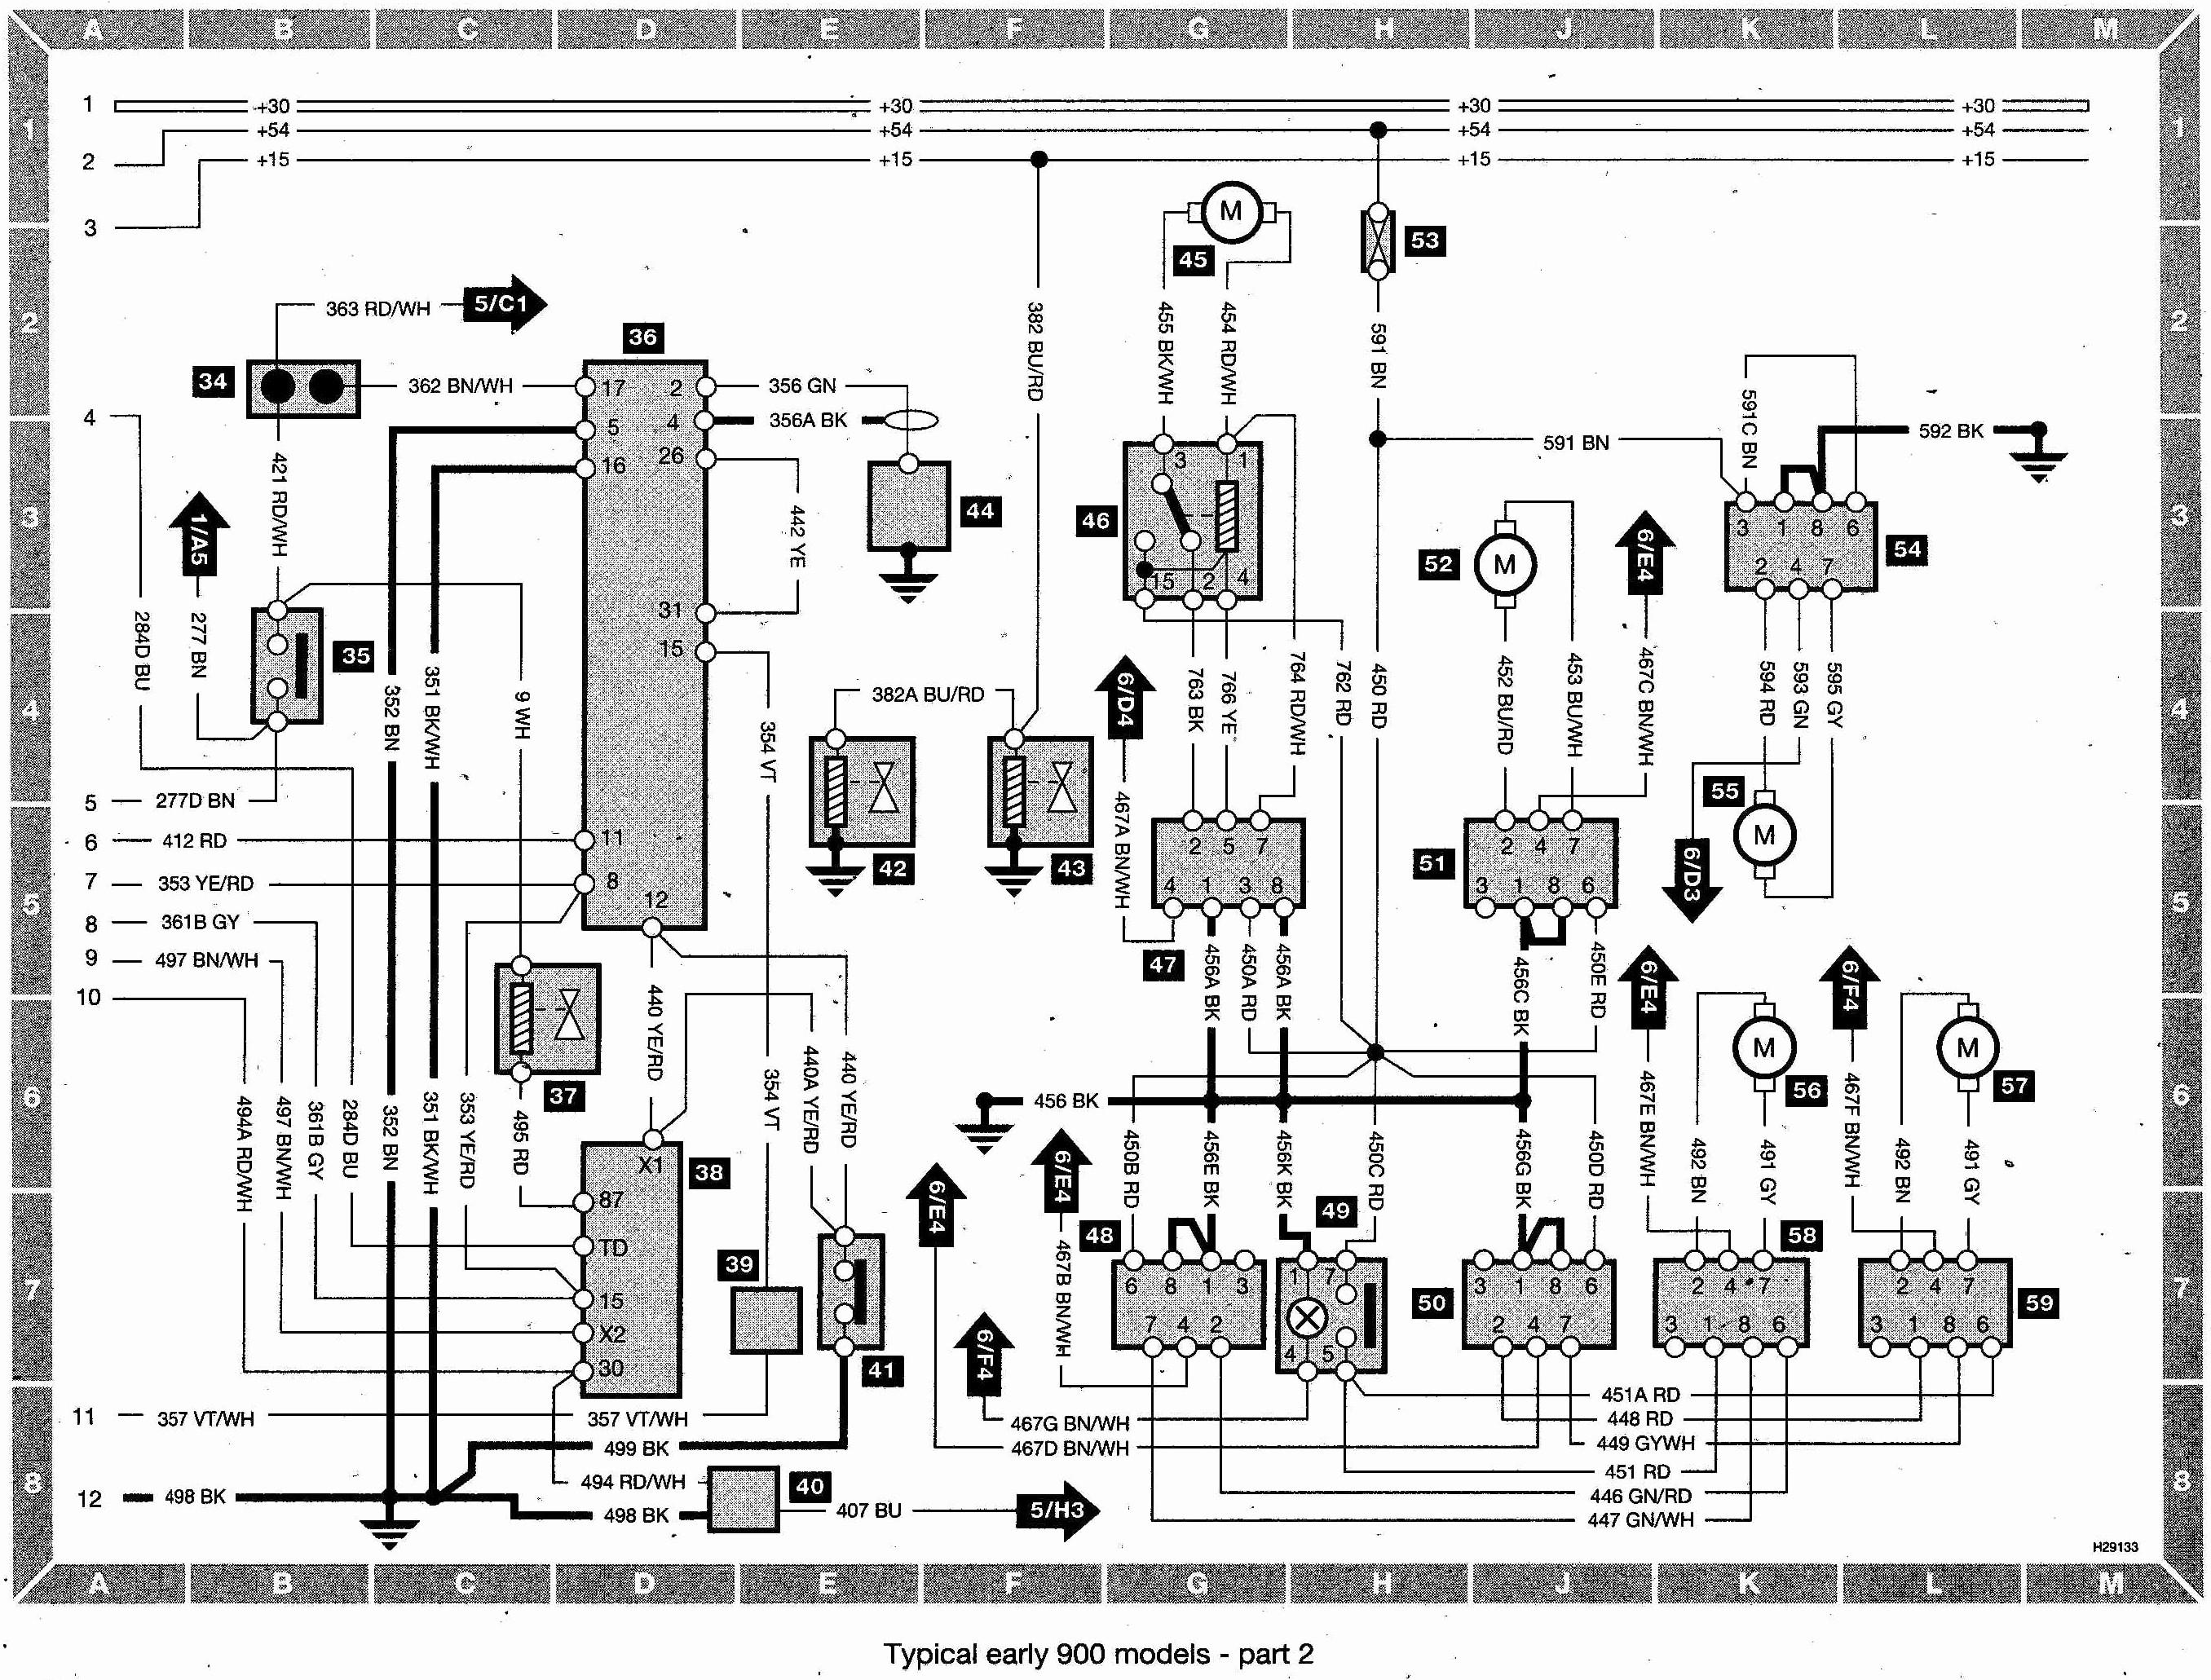 Wiring Diagram For Saab 9 3 Ignition Schematics Diagrams 2011 5 Fuse Box Pdf Smart U2022 Rh Emgsolutions Co 1999 Speakers